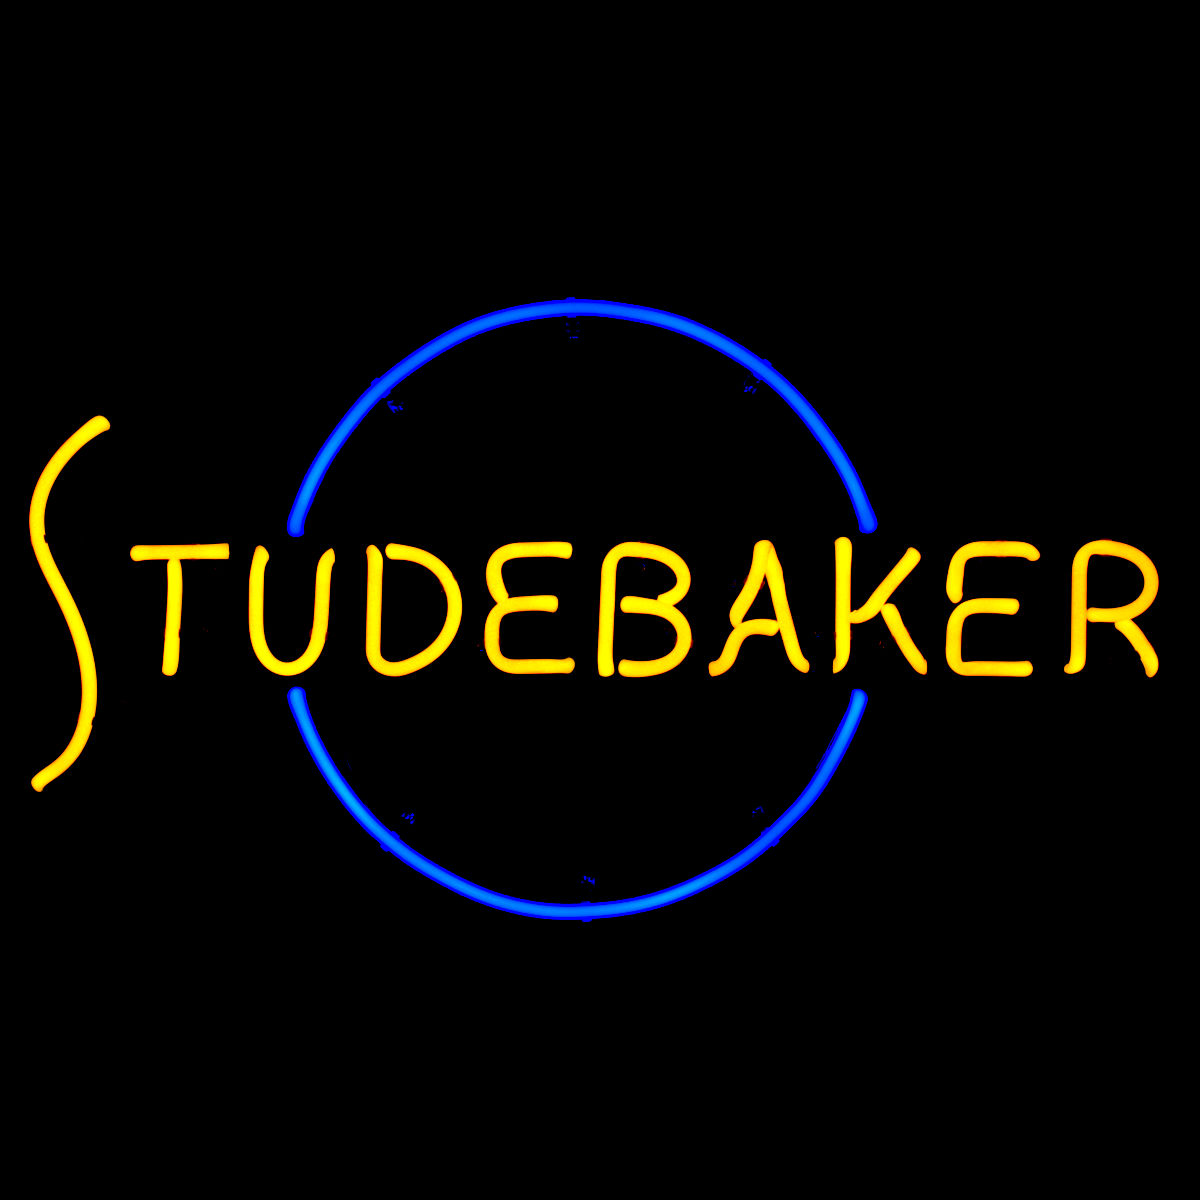 Custom Studebaker Neon Signs by former New Studebaker Dealer - John Barton - BartonNeonMagic.com